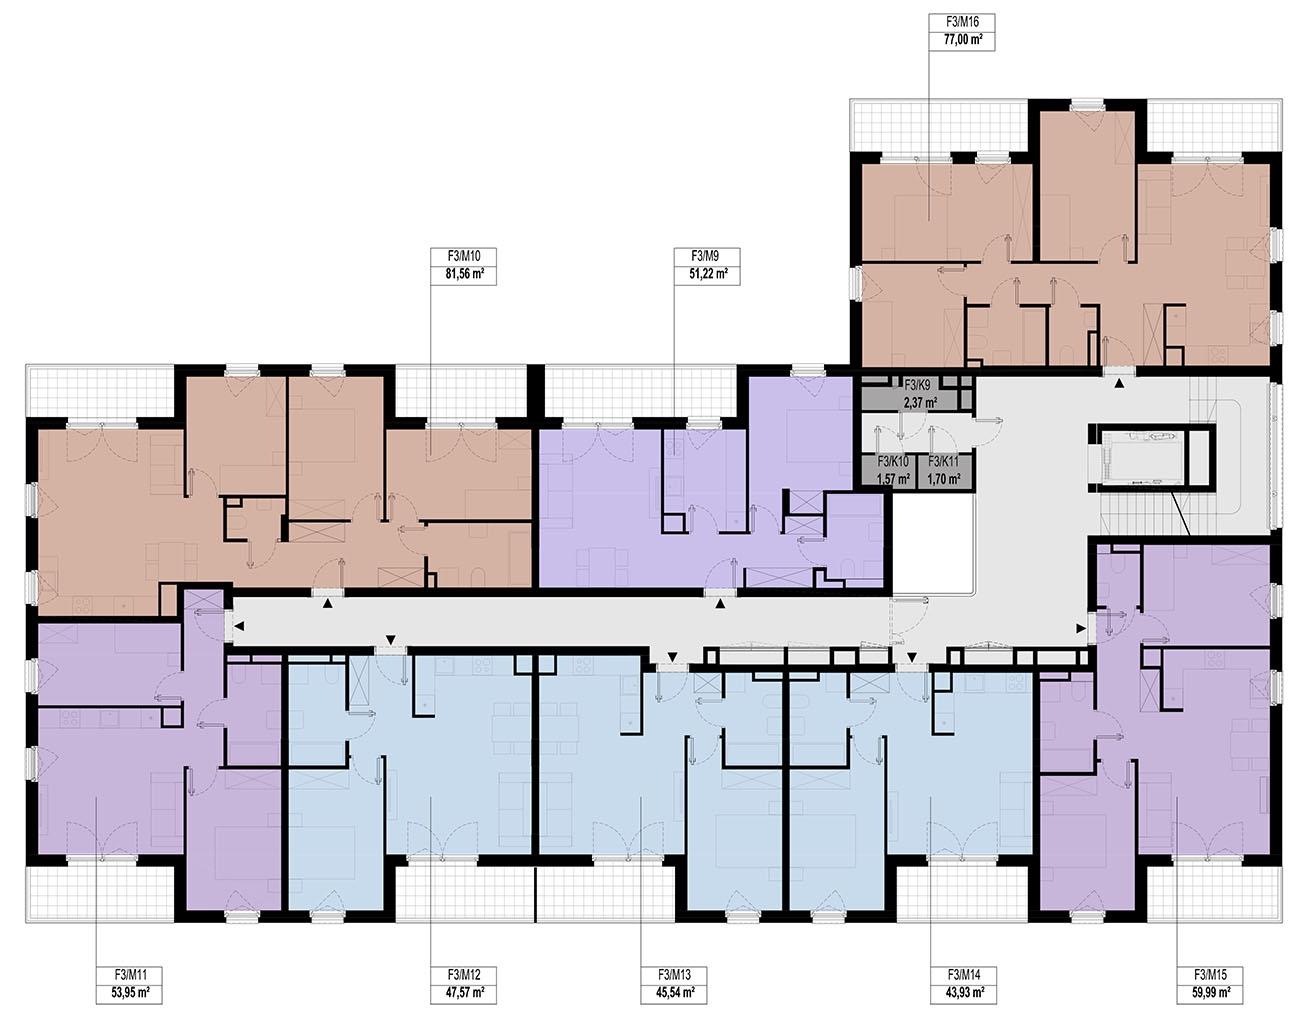 Etap 3 - Budynek F - Piętro 1